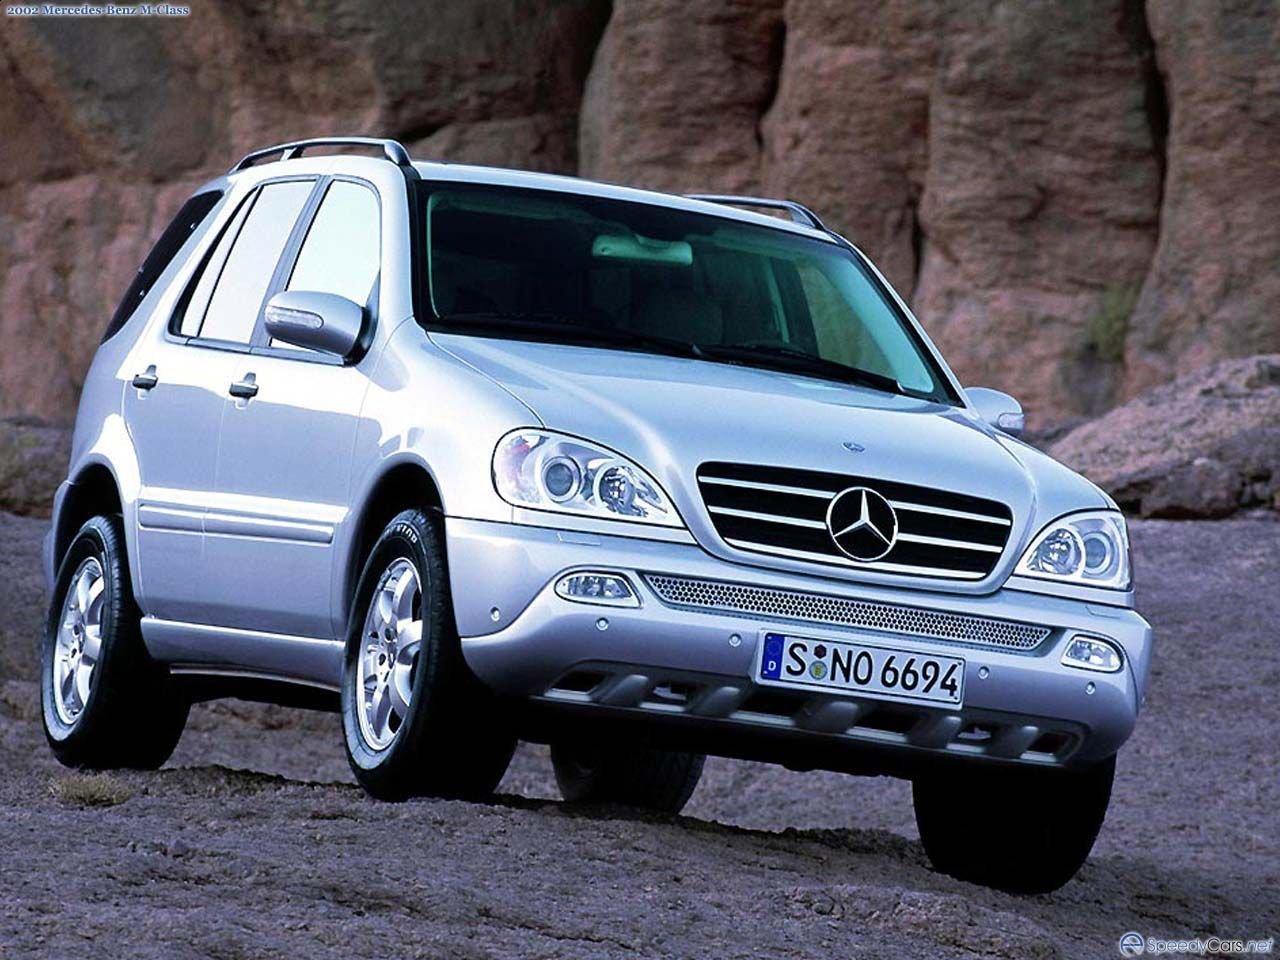 Mercedes Ml Class W163 Door Latch Actuators Repair Kit Benz Ml270 Fuel Filter 2002 Spring X2 X8r0071 Automotive